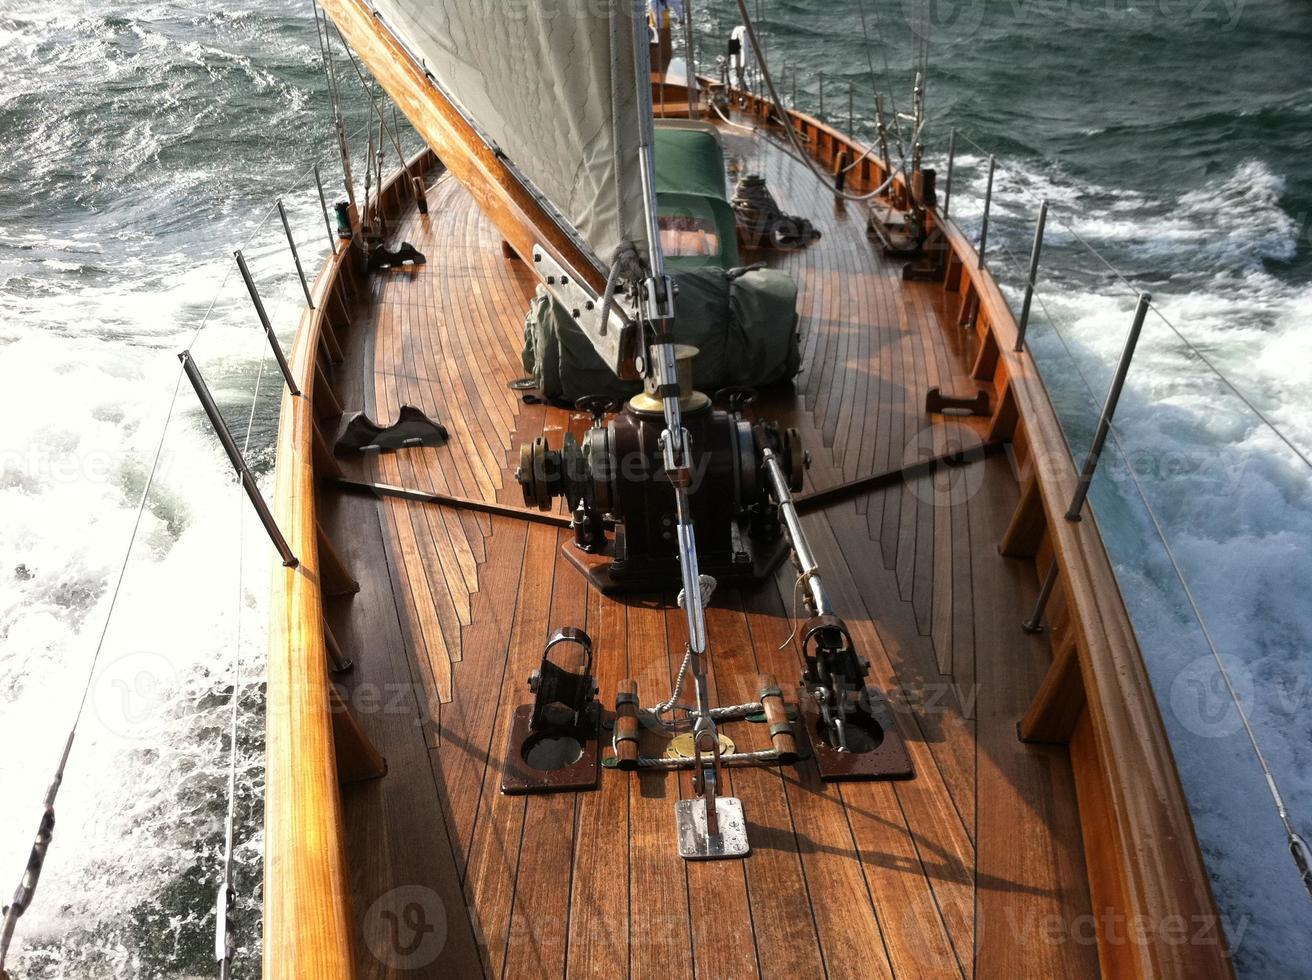 classic Sailing Yacht at Sea photo